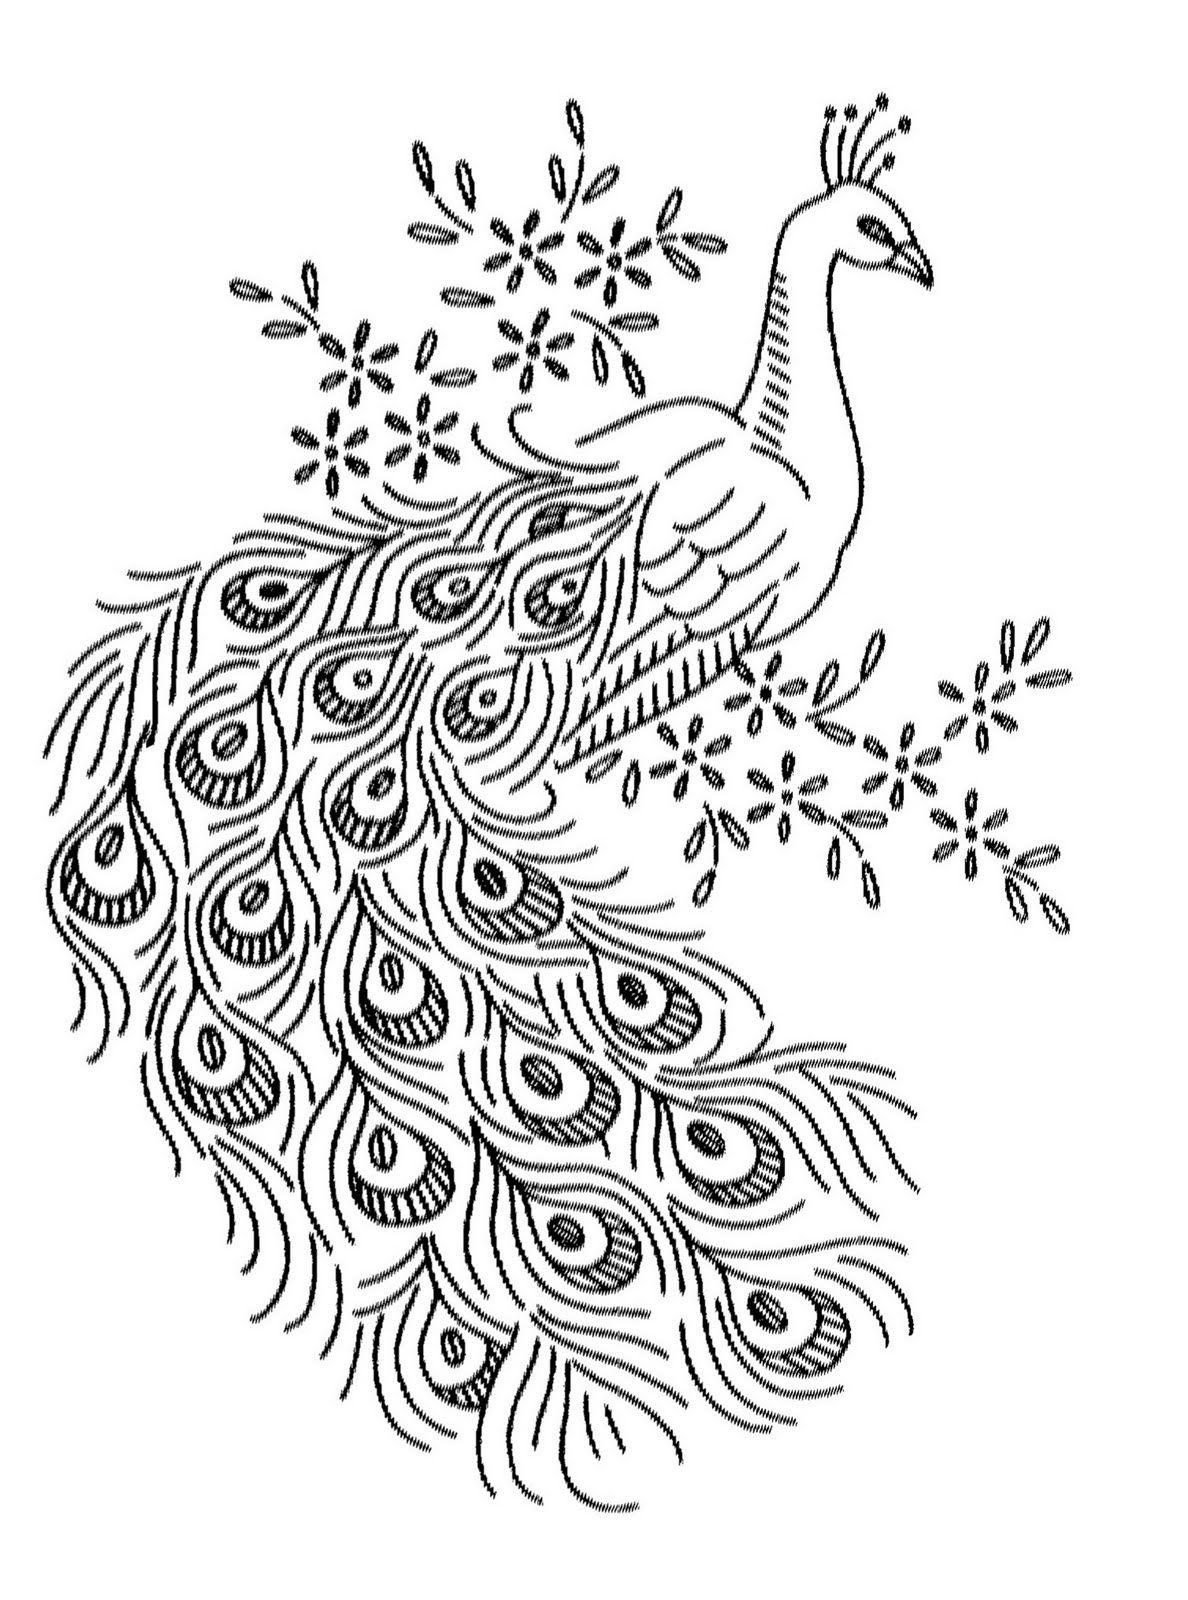 Vintage Embroidery Patterns Interesting Design